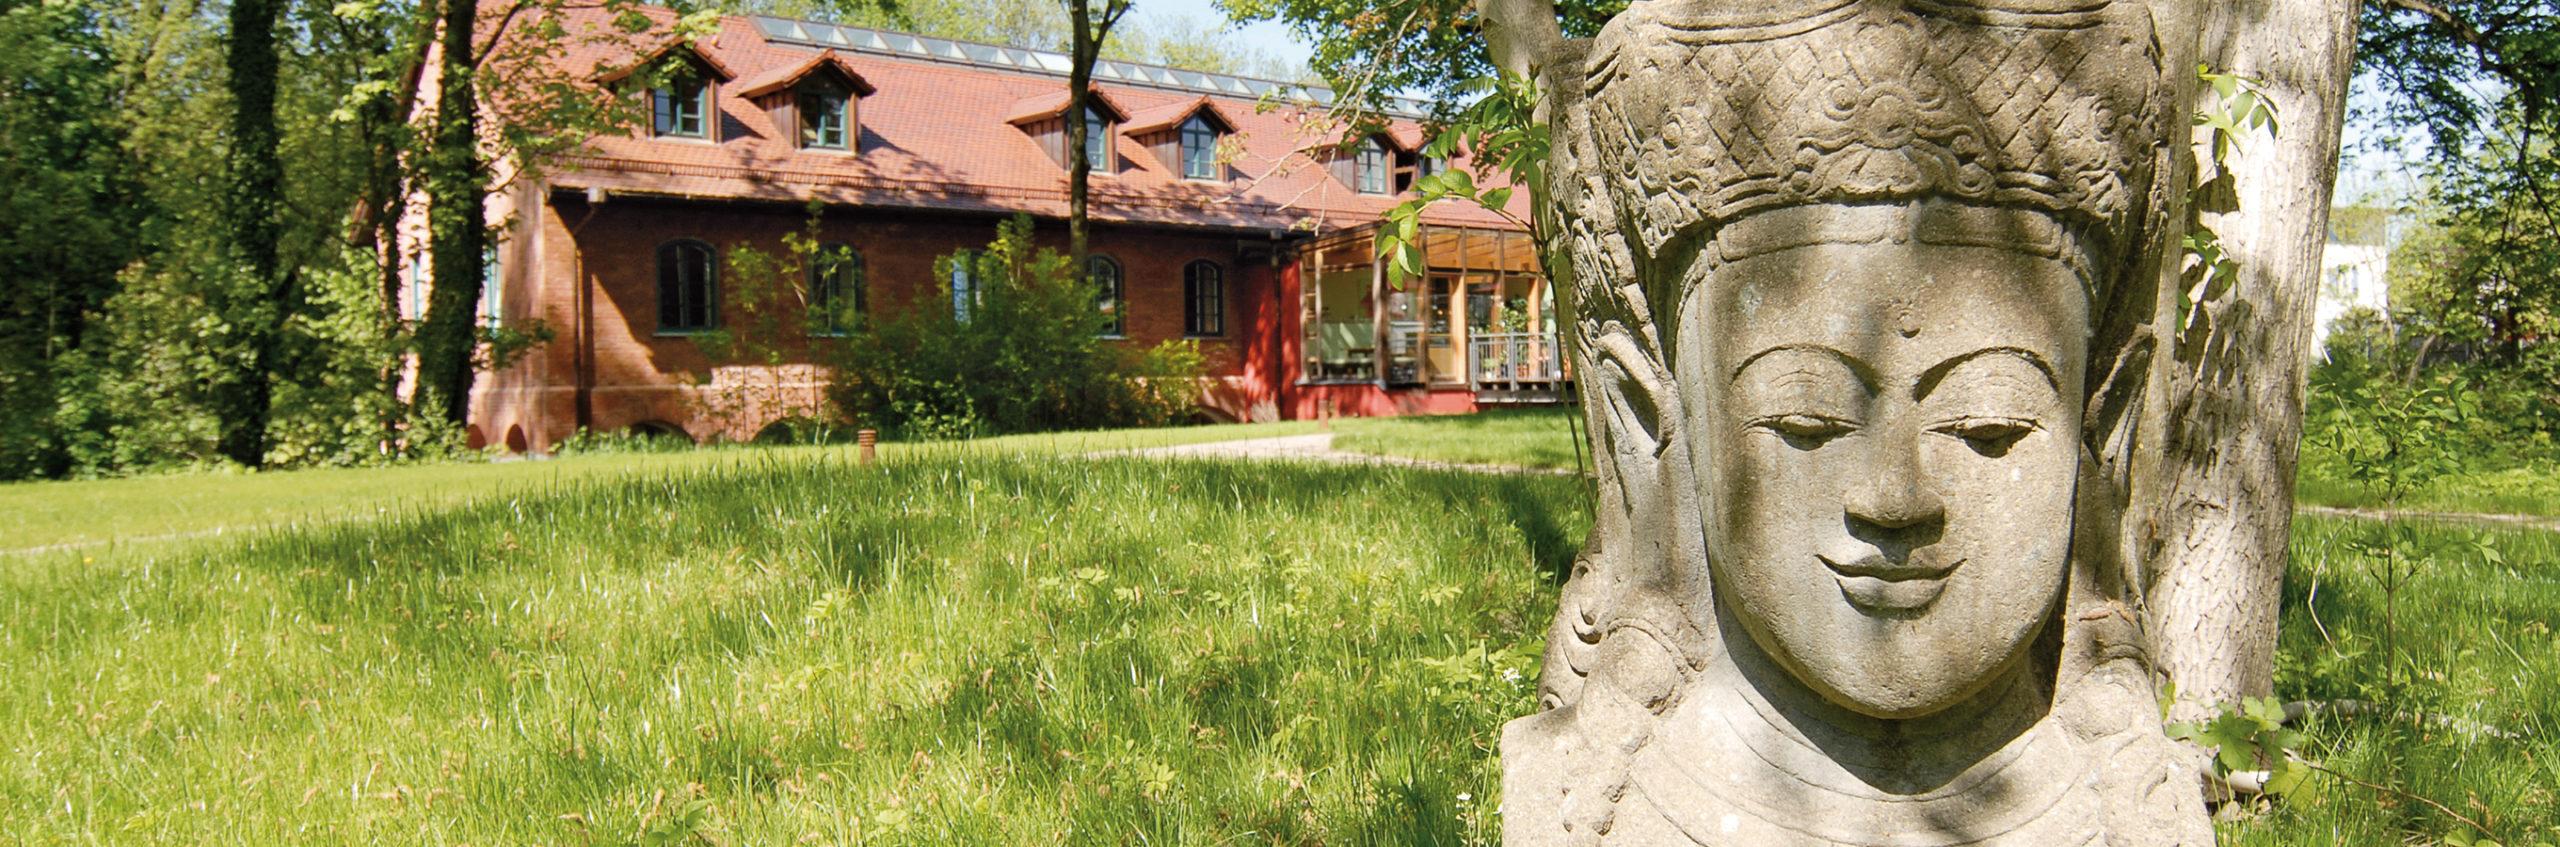 RoSana Kur- und Gästehaus Vastugarten